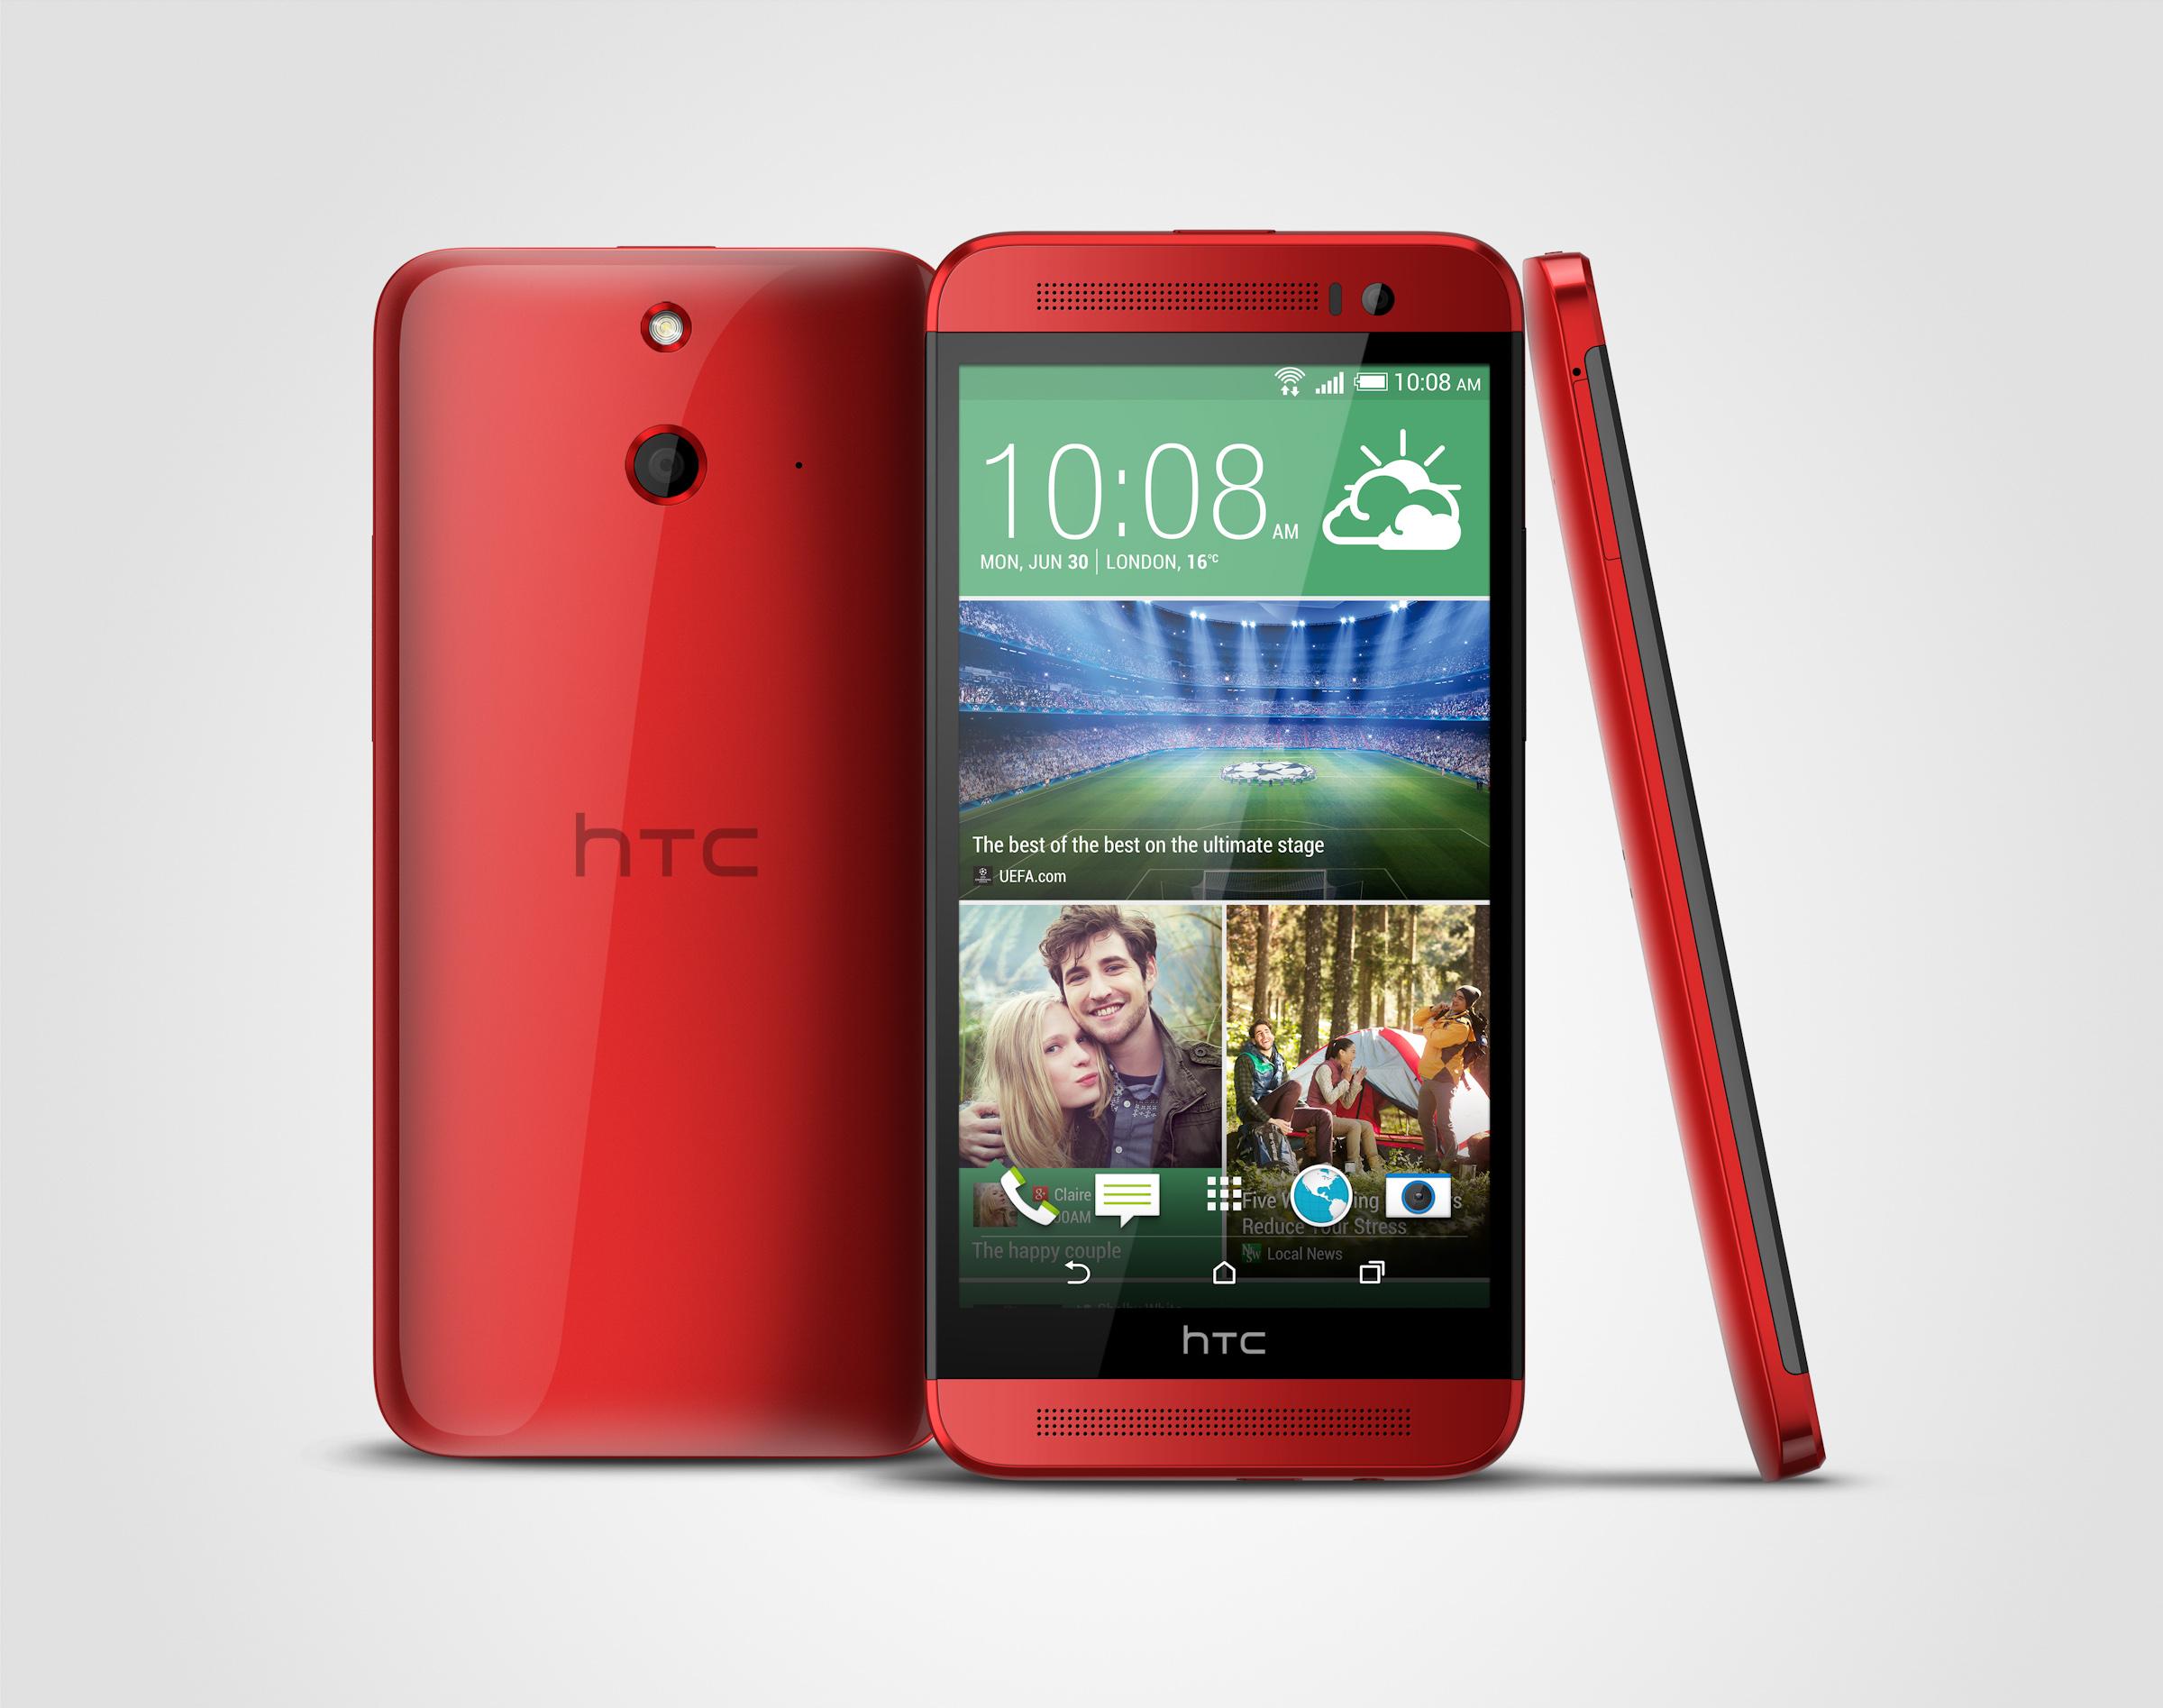 HTC One M8 Ace Press Shots -2